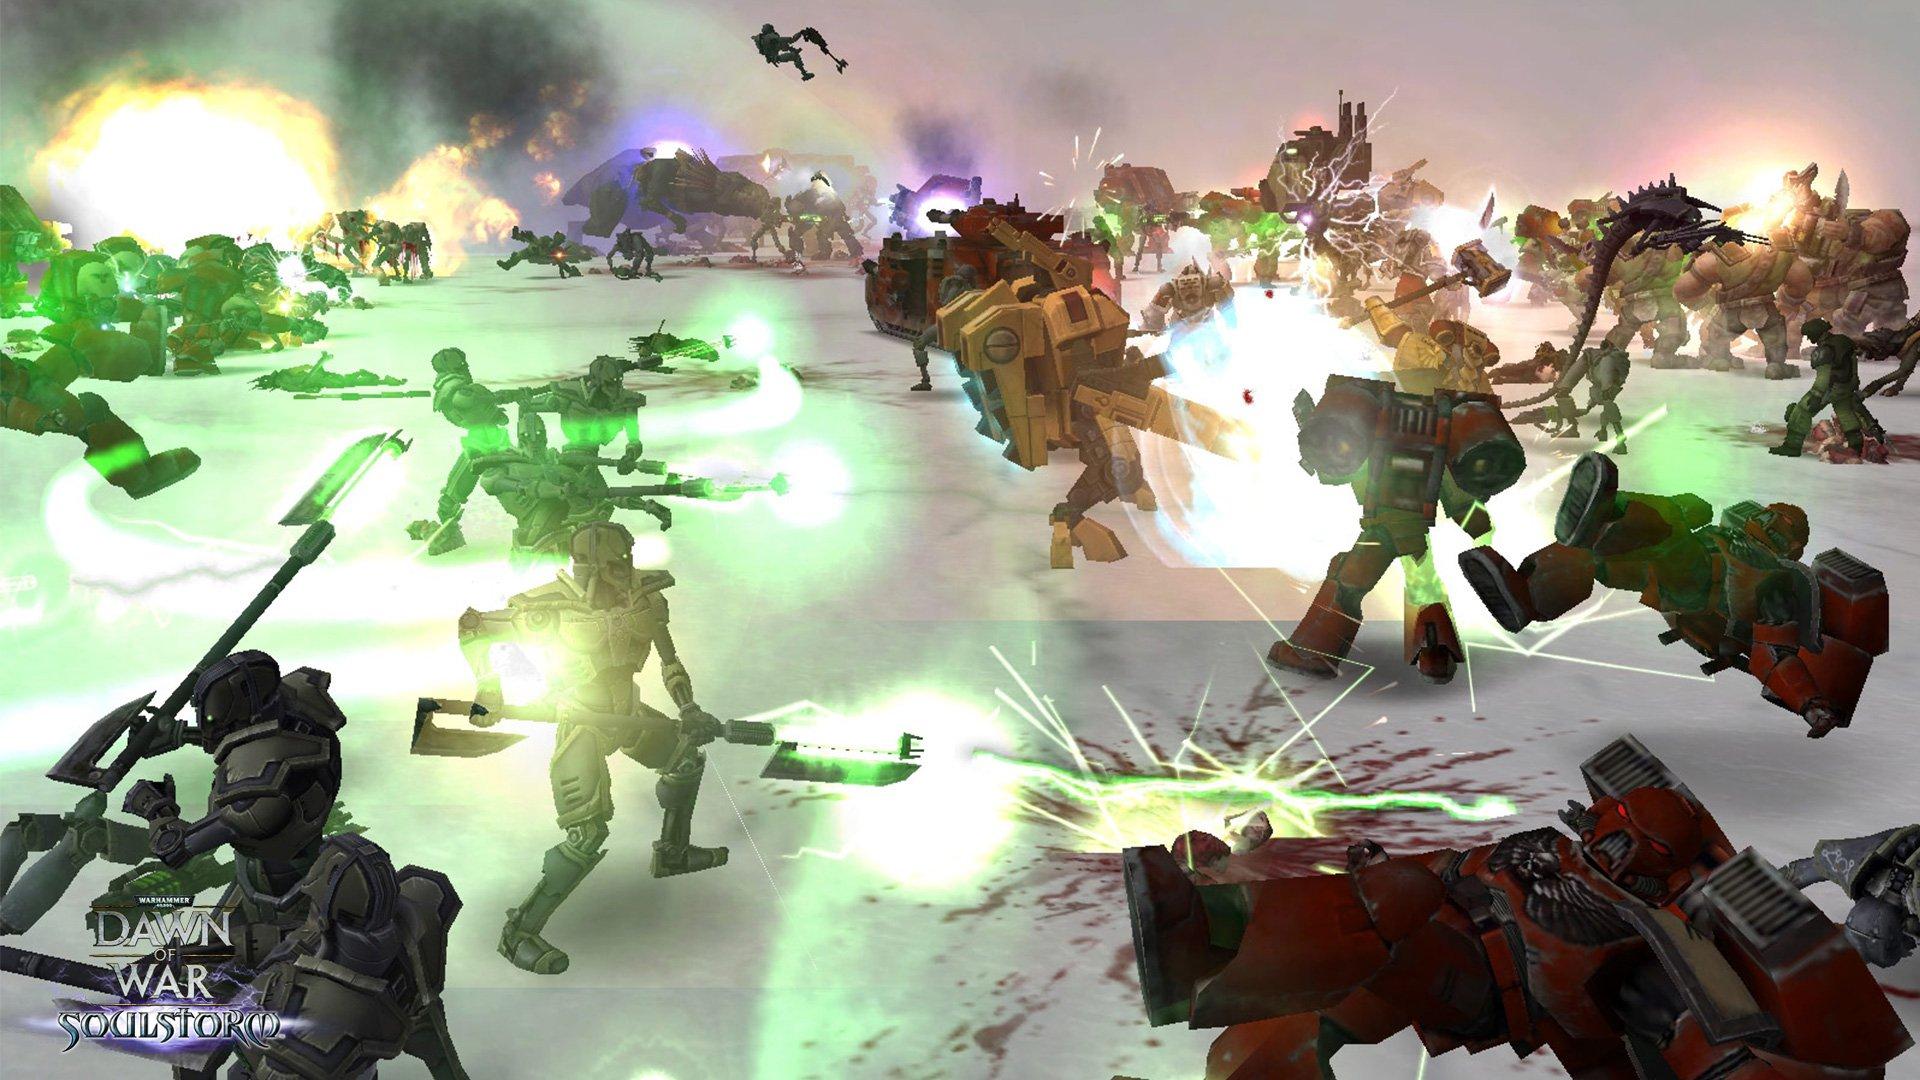 Warhammer 40,000 Dawn of War Soulstorm 11